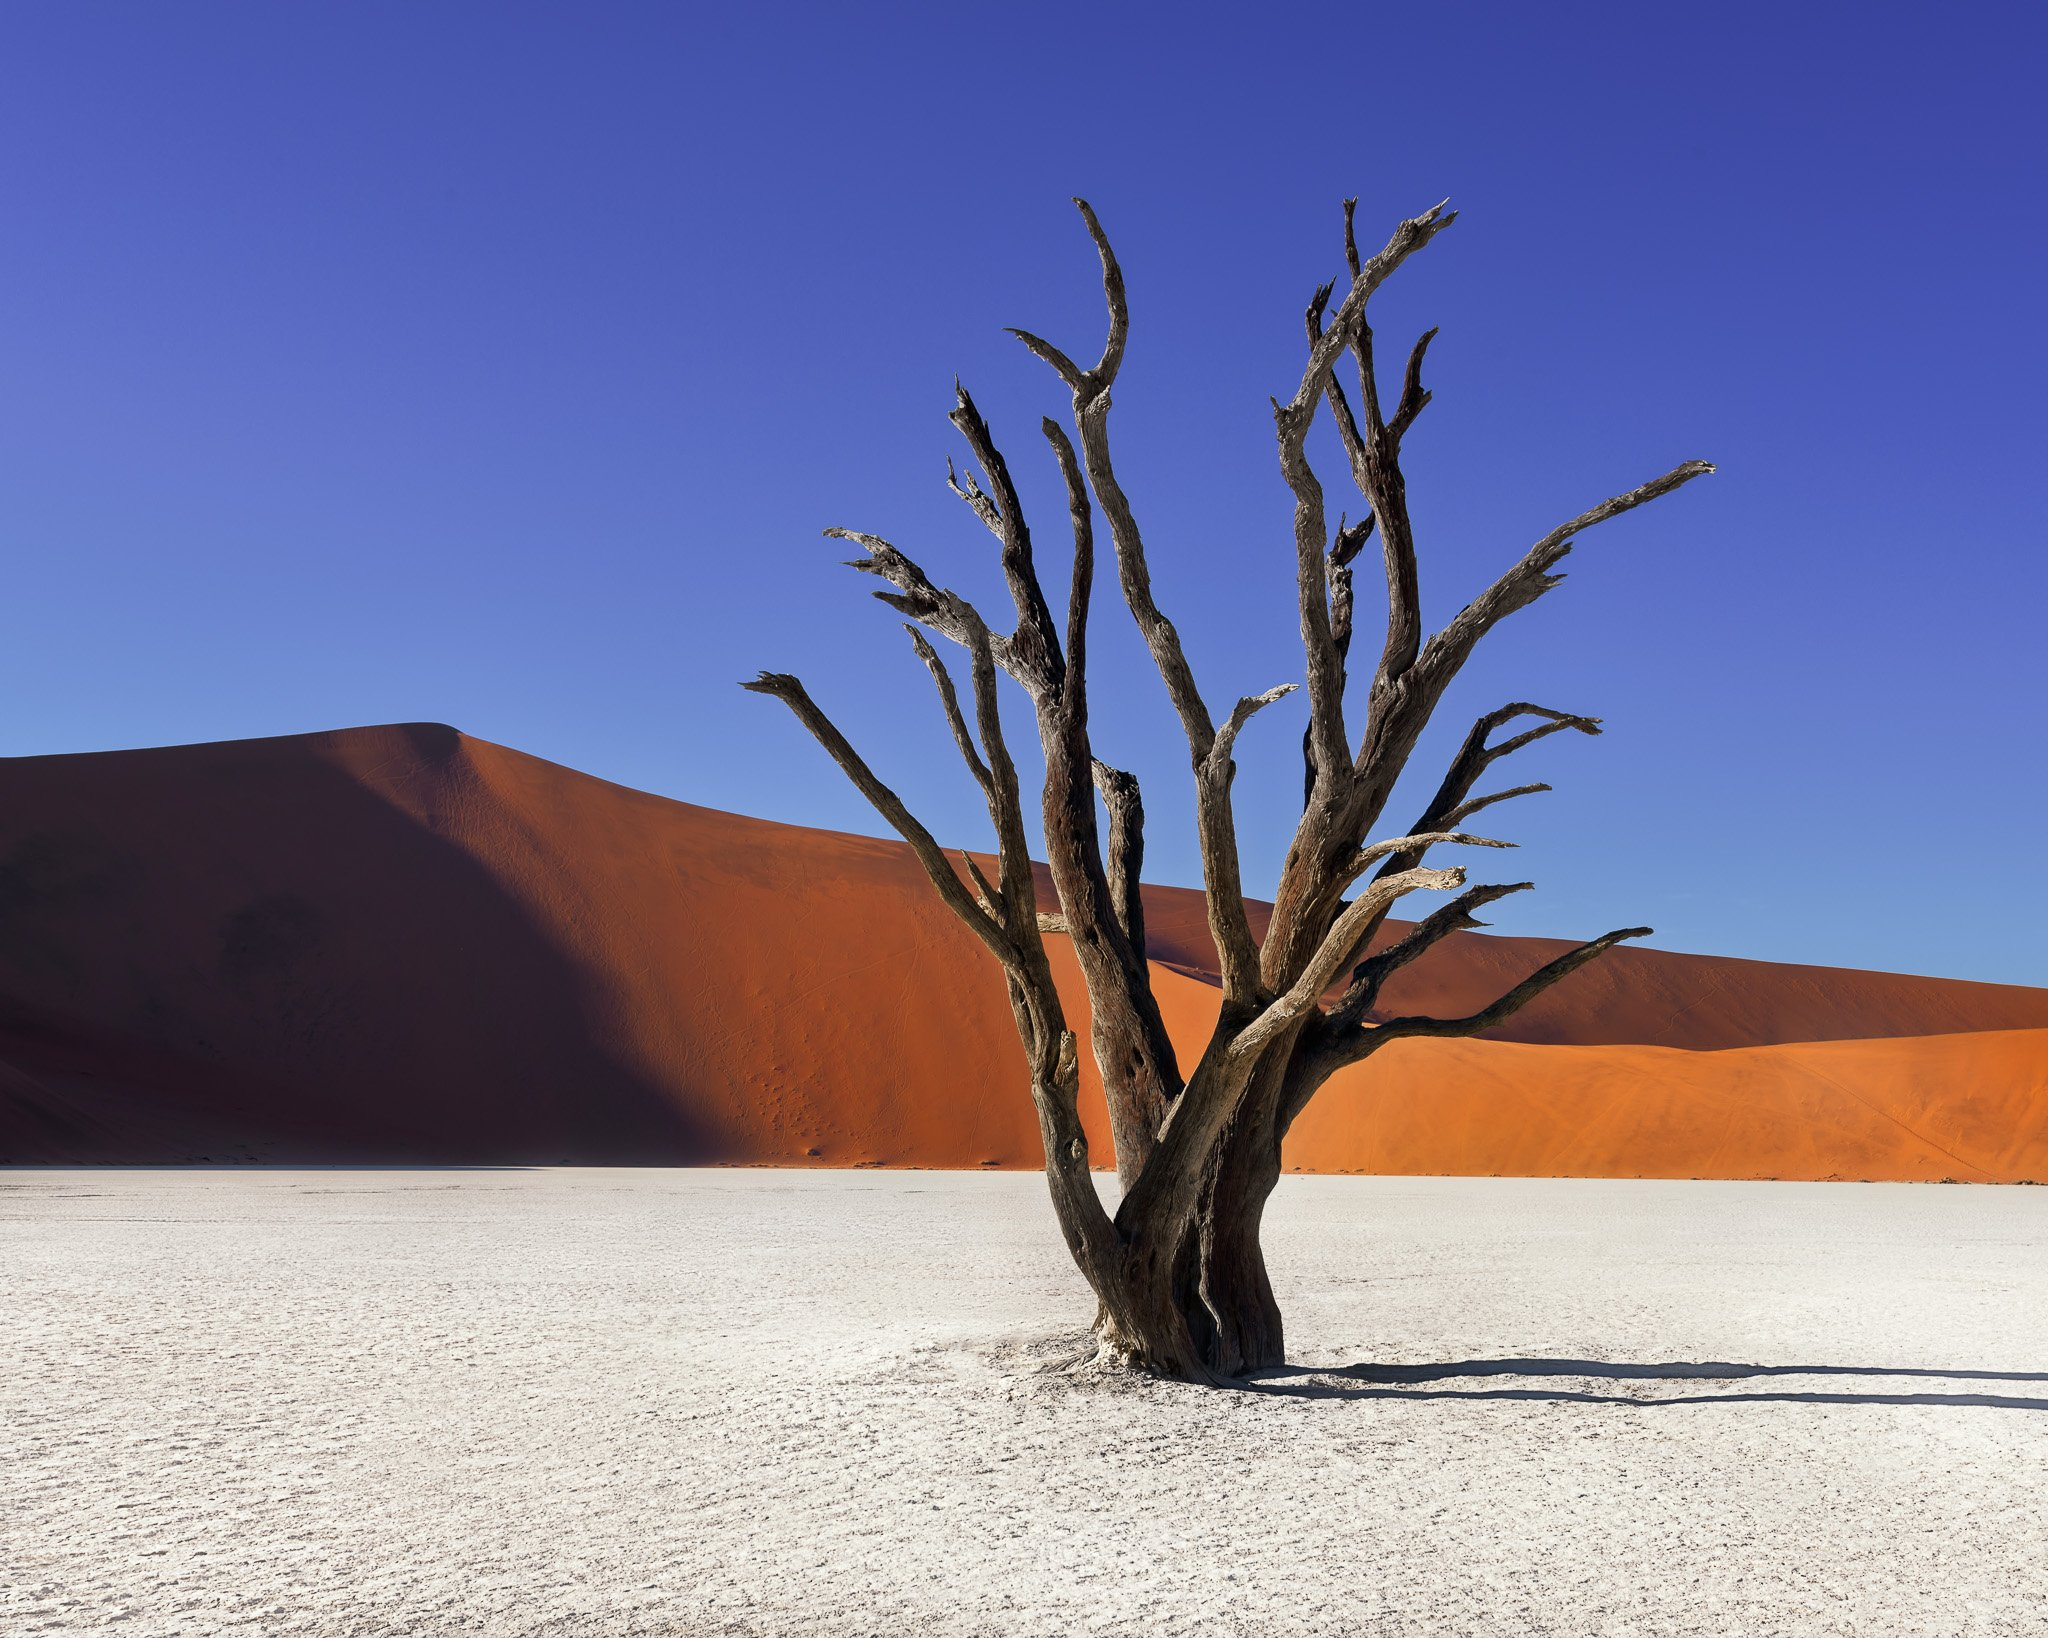 acacia, Africa, african, arid, beautiful, blue, branch, camelthorn, clay, day, daylight, dead, deadvlei, desert, drought, dry, dune, famous, forest, hot, lake, landmark, landscape, morning, namib, namibia, namibian, national, nature, naukluft, orange, out, anshar